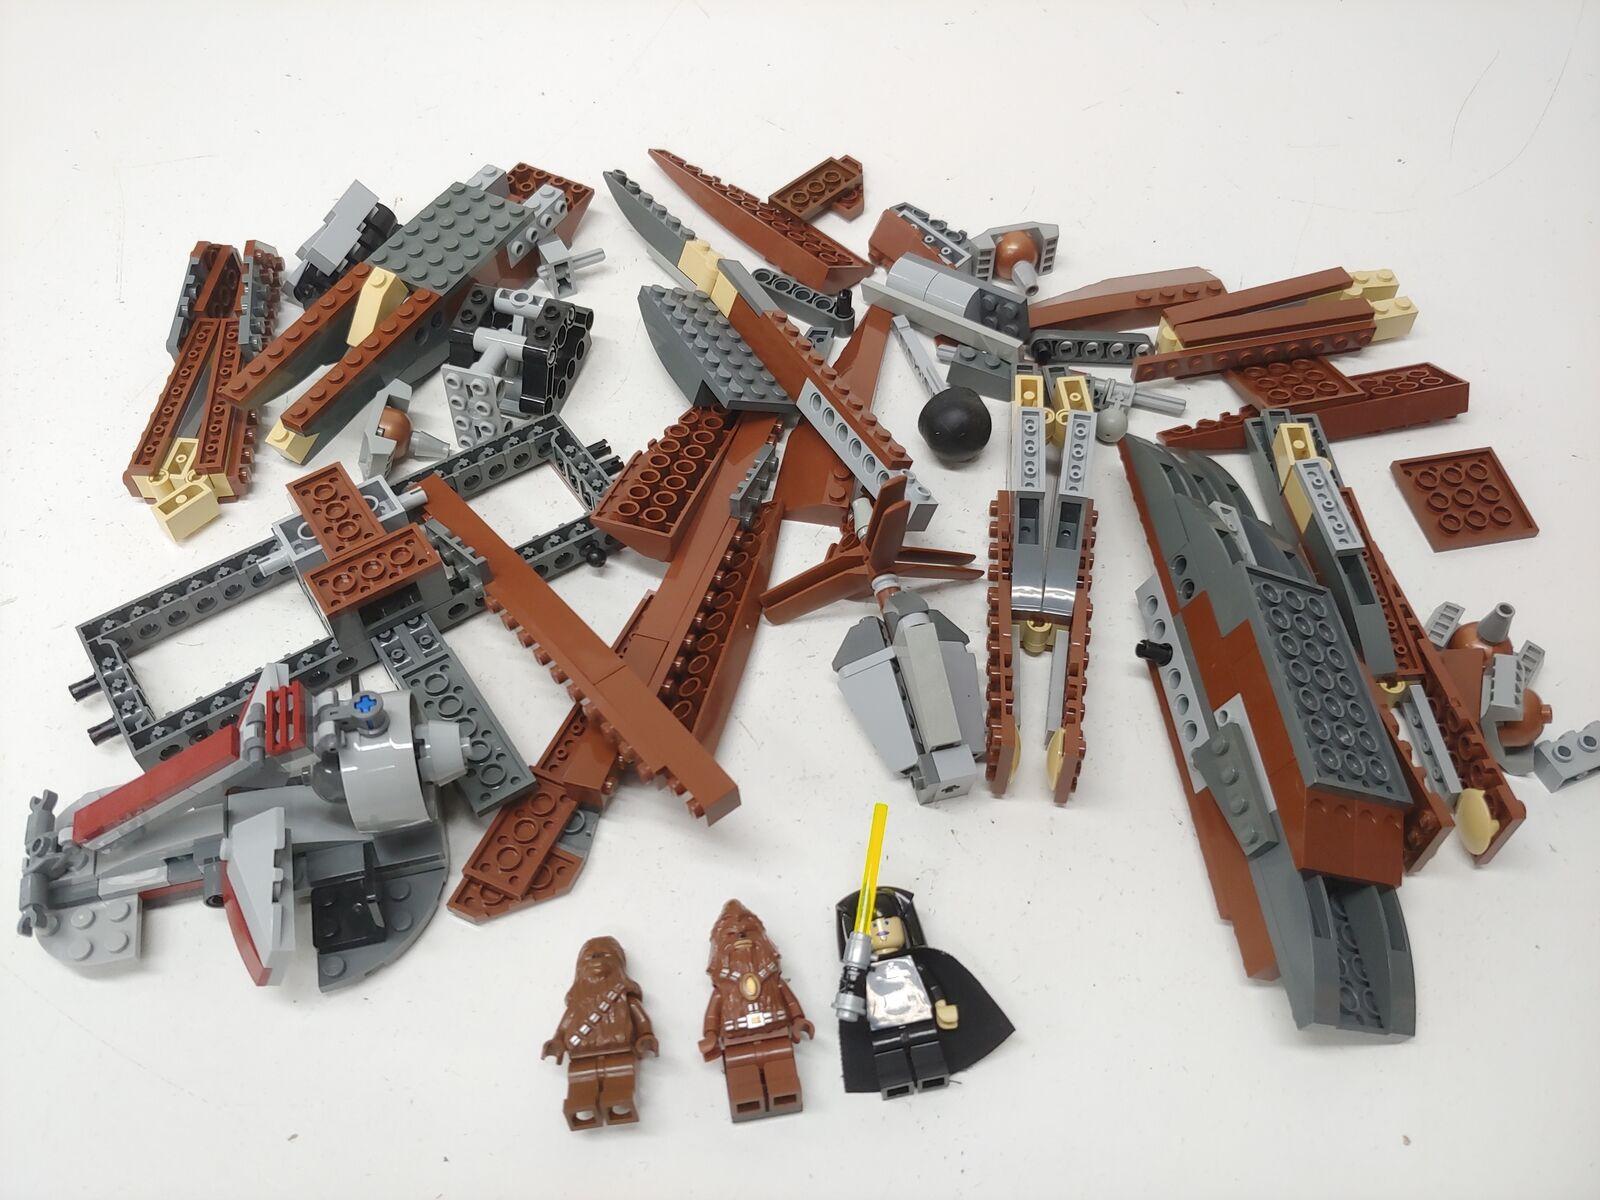 Lego Guerra De Las Galaxias Episodio Iii Wookiee catamarán (7260) con 3 Minifiguras